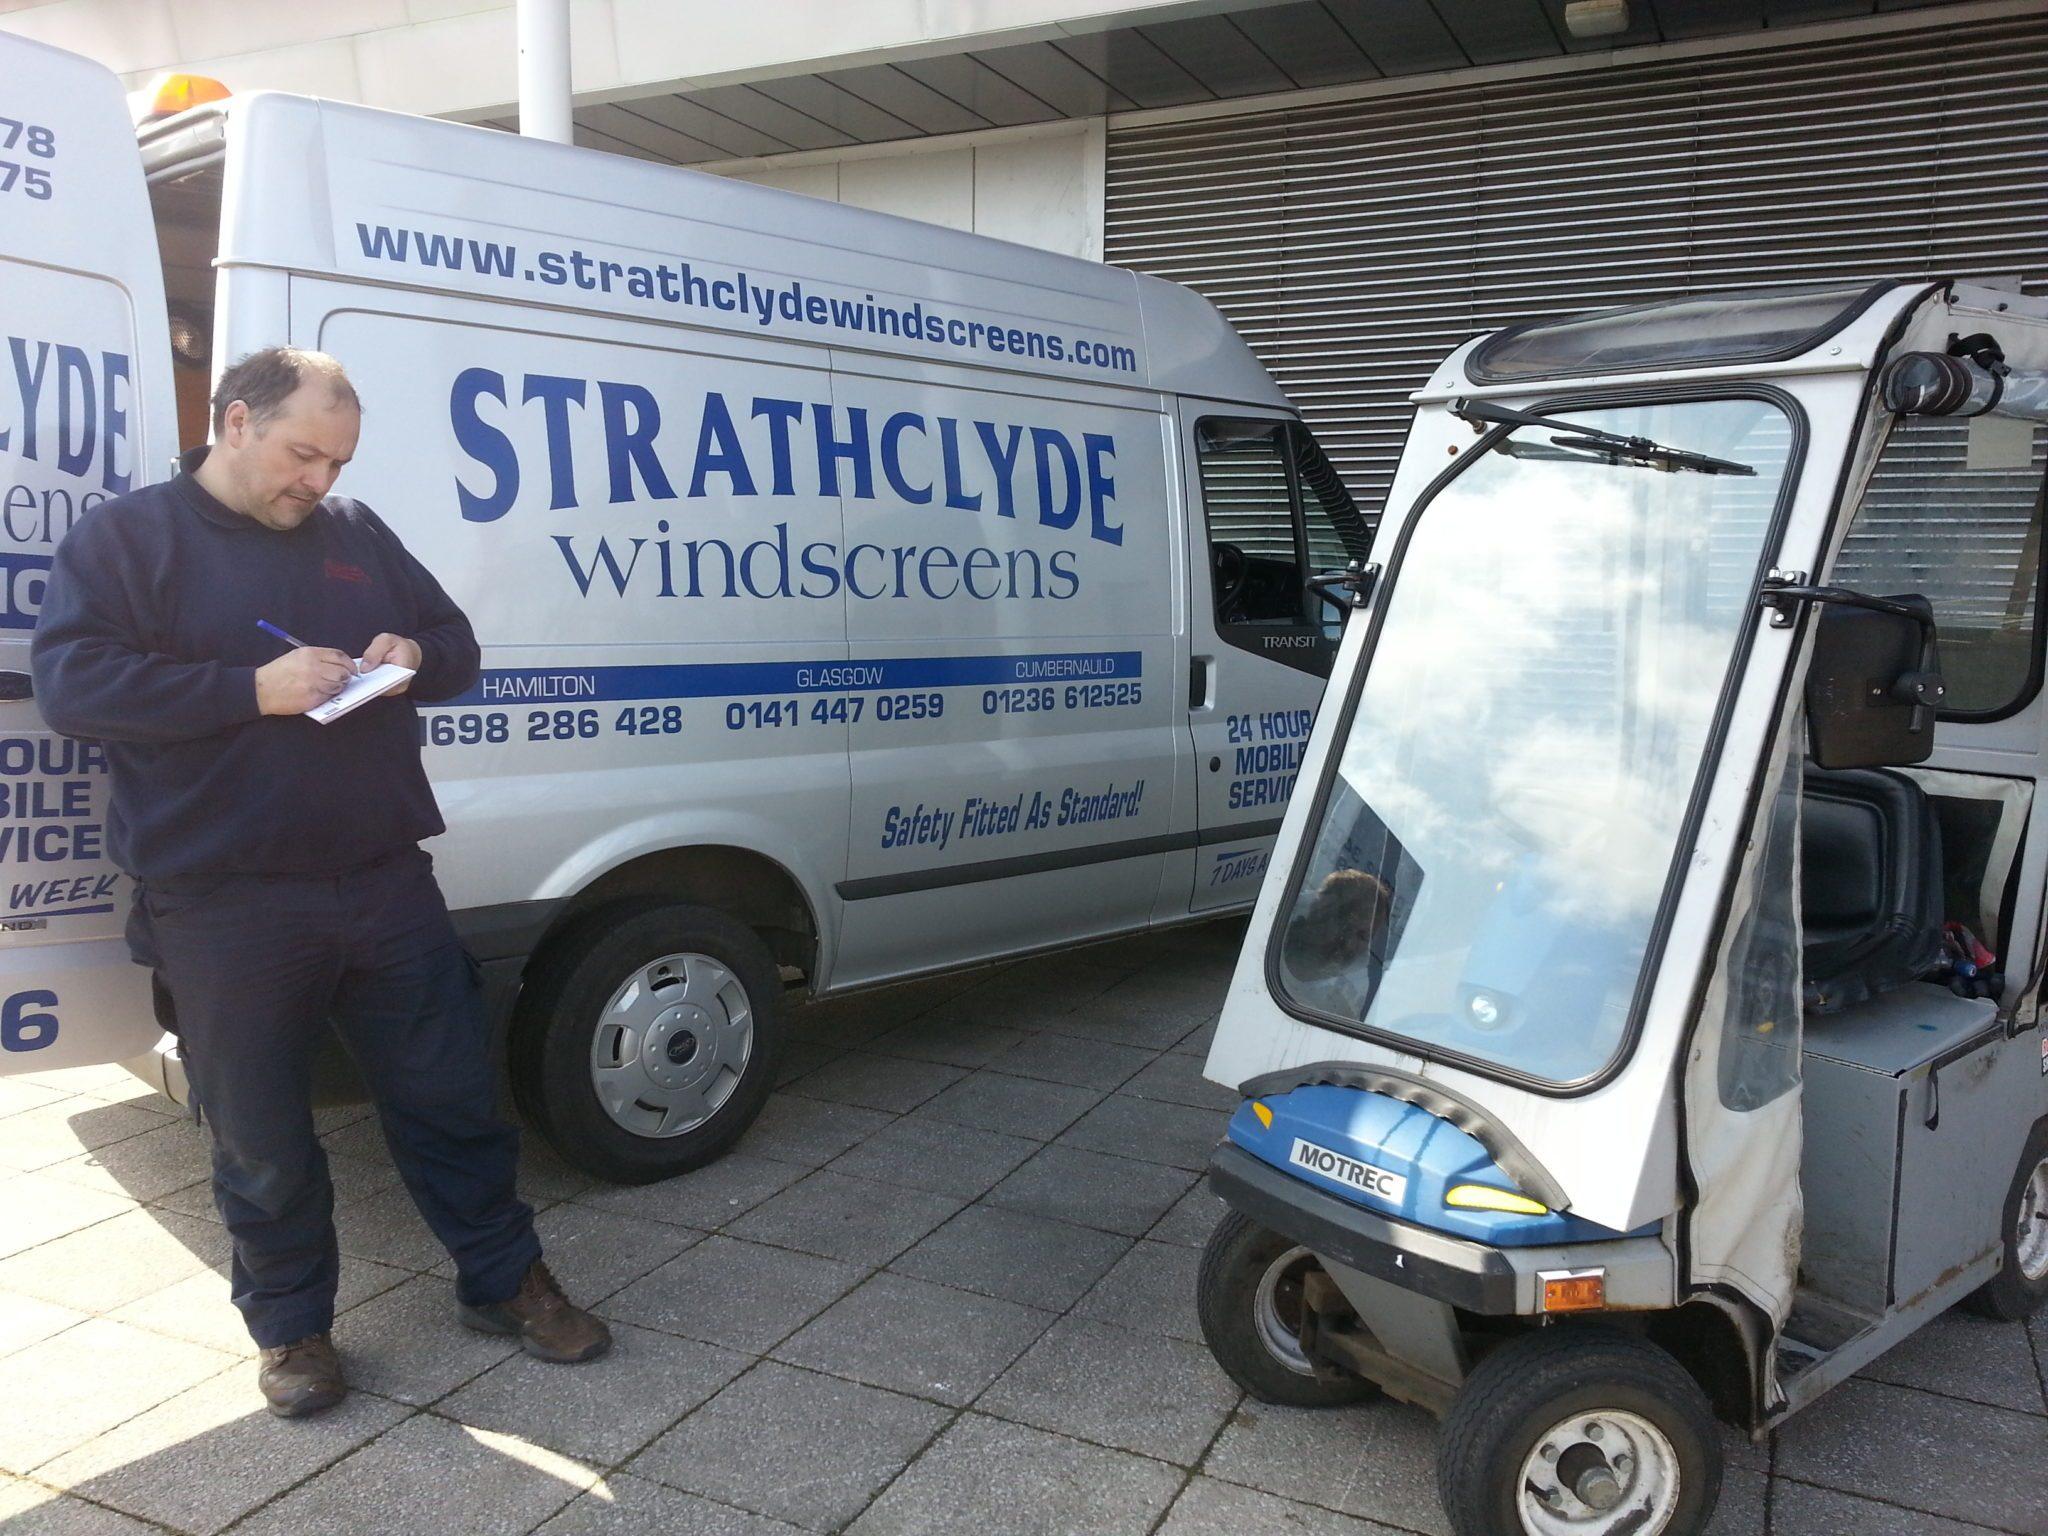 Why car insurance companies love us Strathclyde Windscreen Repair